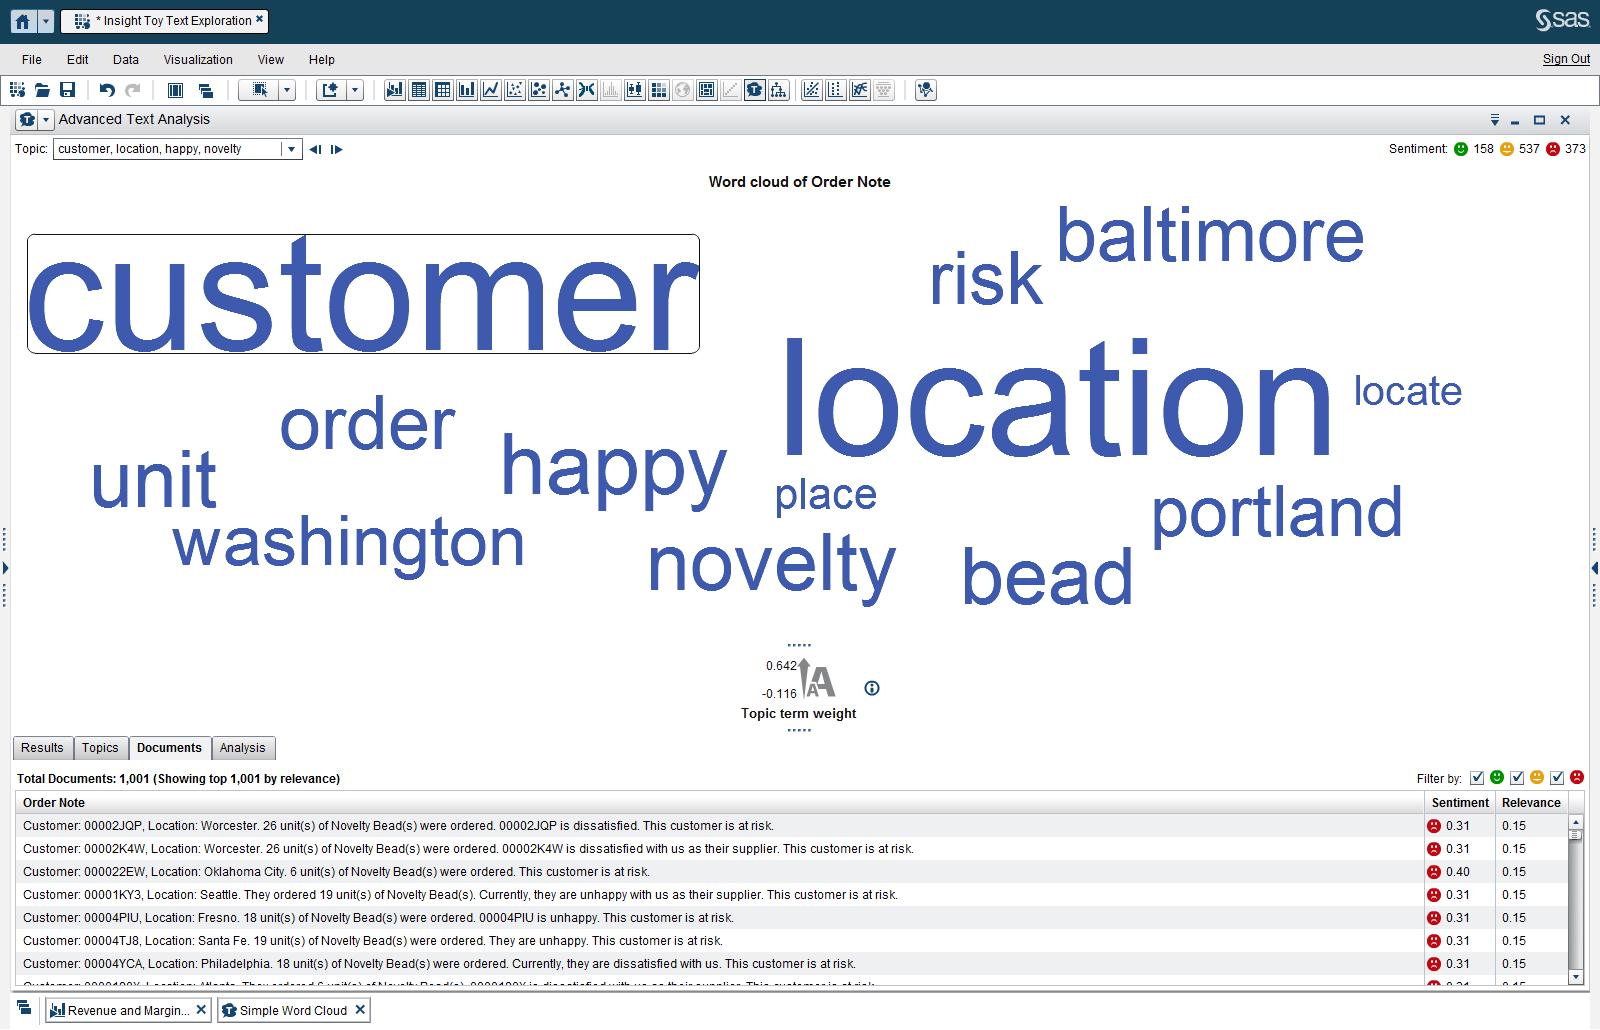 SAS Visual Analytics Software - Analyze text & social media